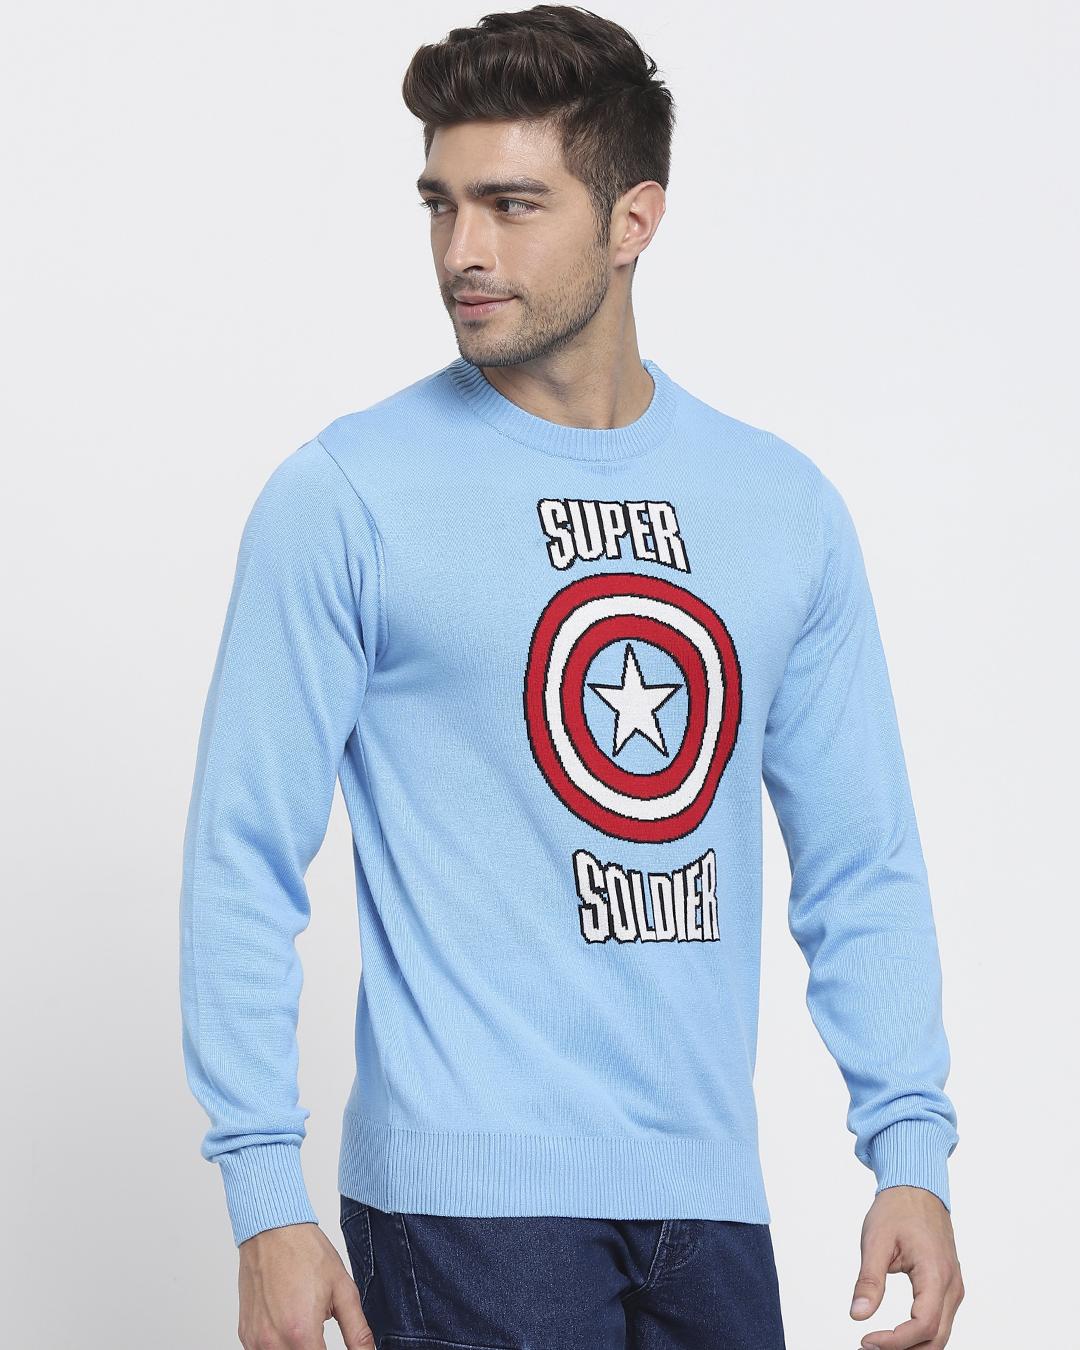 ShopBlue Quartz Full Sleeve Flat Knit Sweater-Back